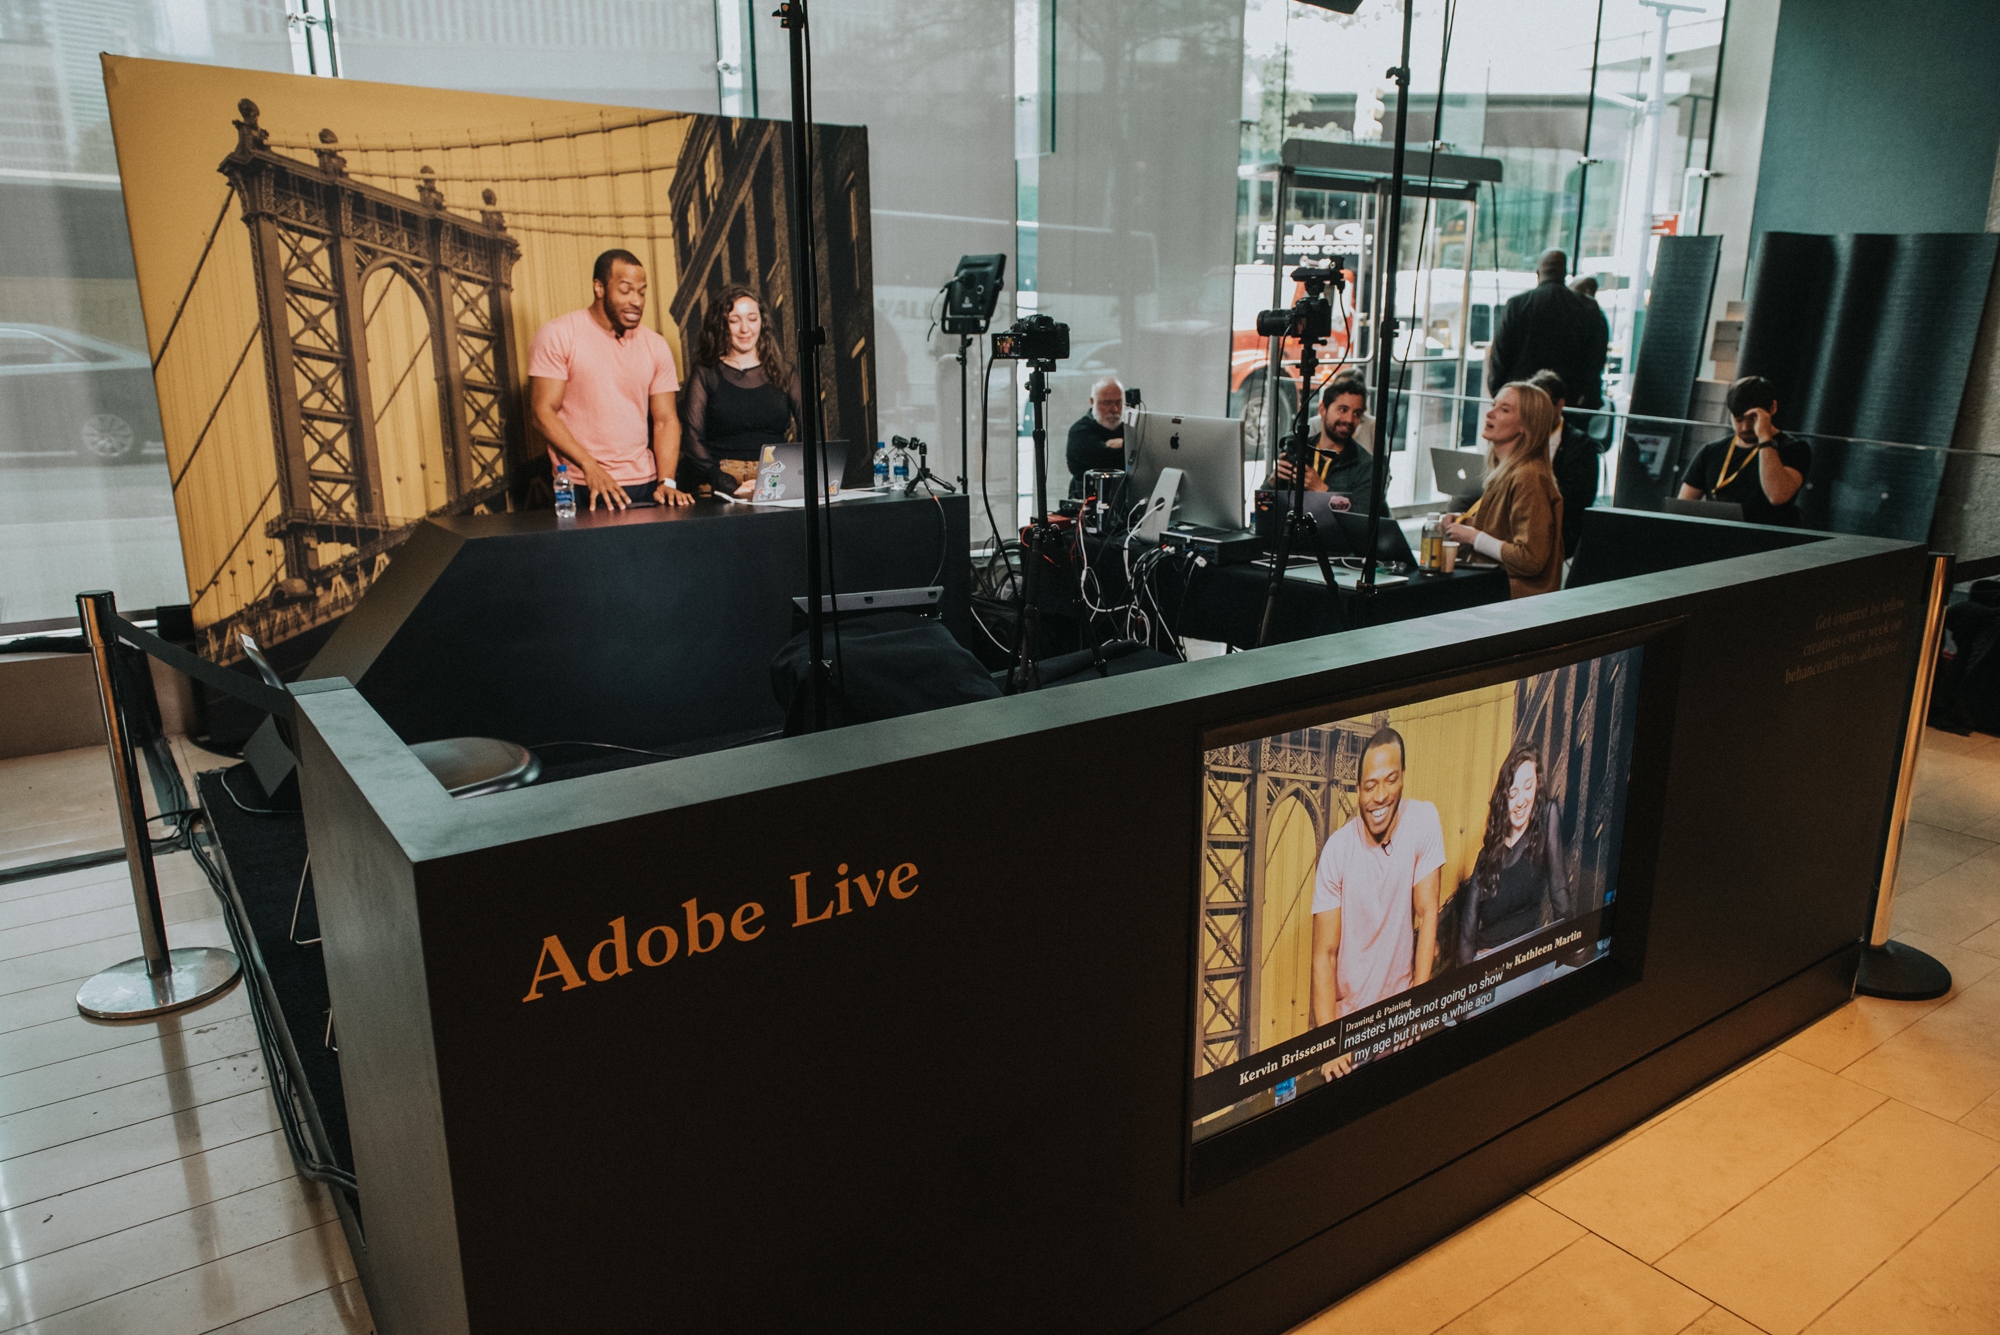 adobe live-RyanMuir-8427.jpg